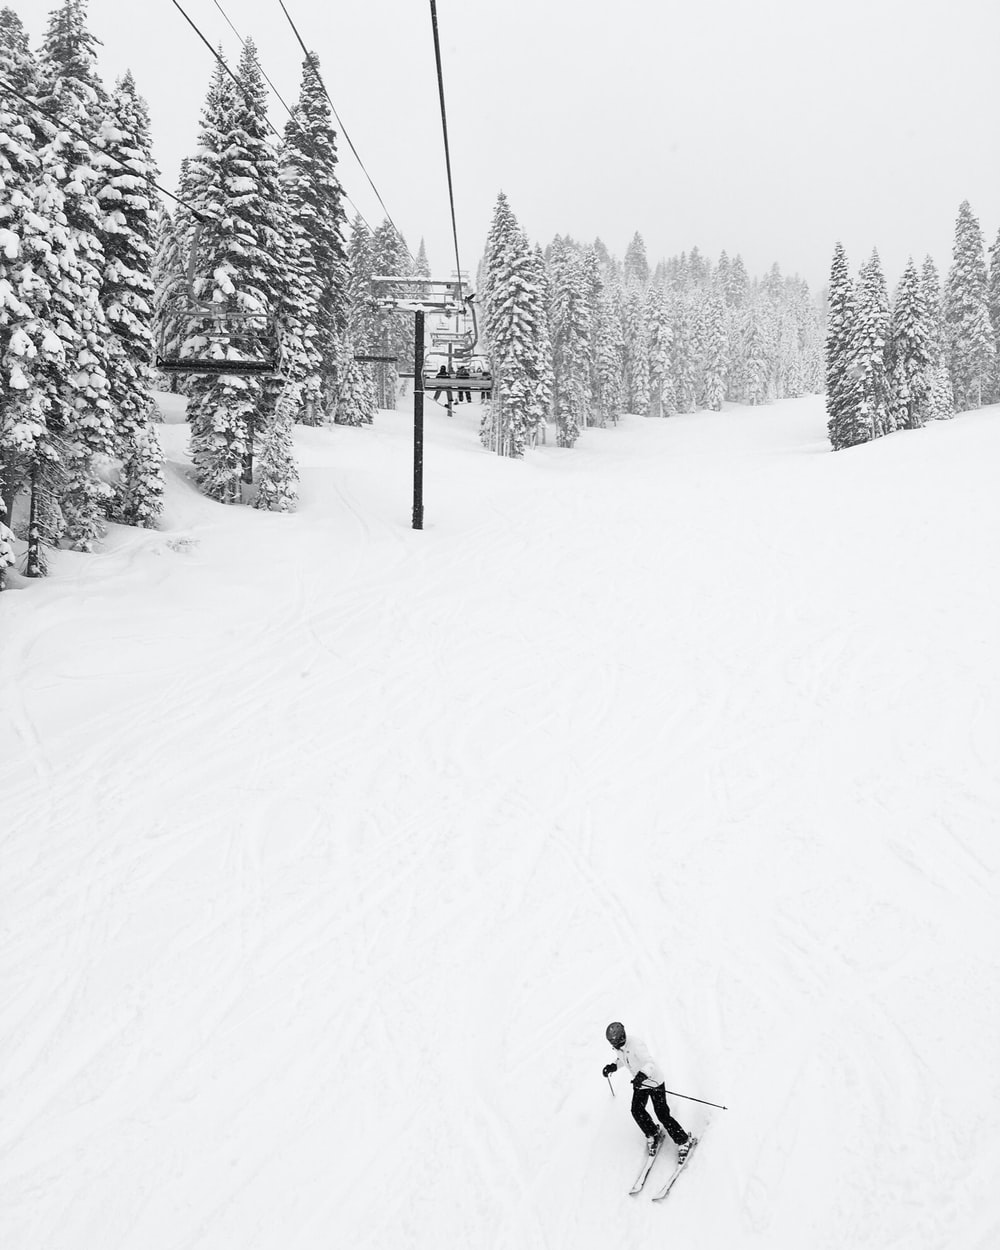 man doing ski near cable car, ski California Gold pass